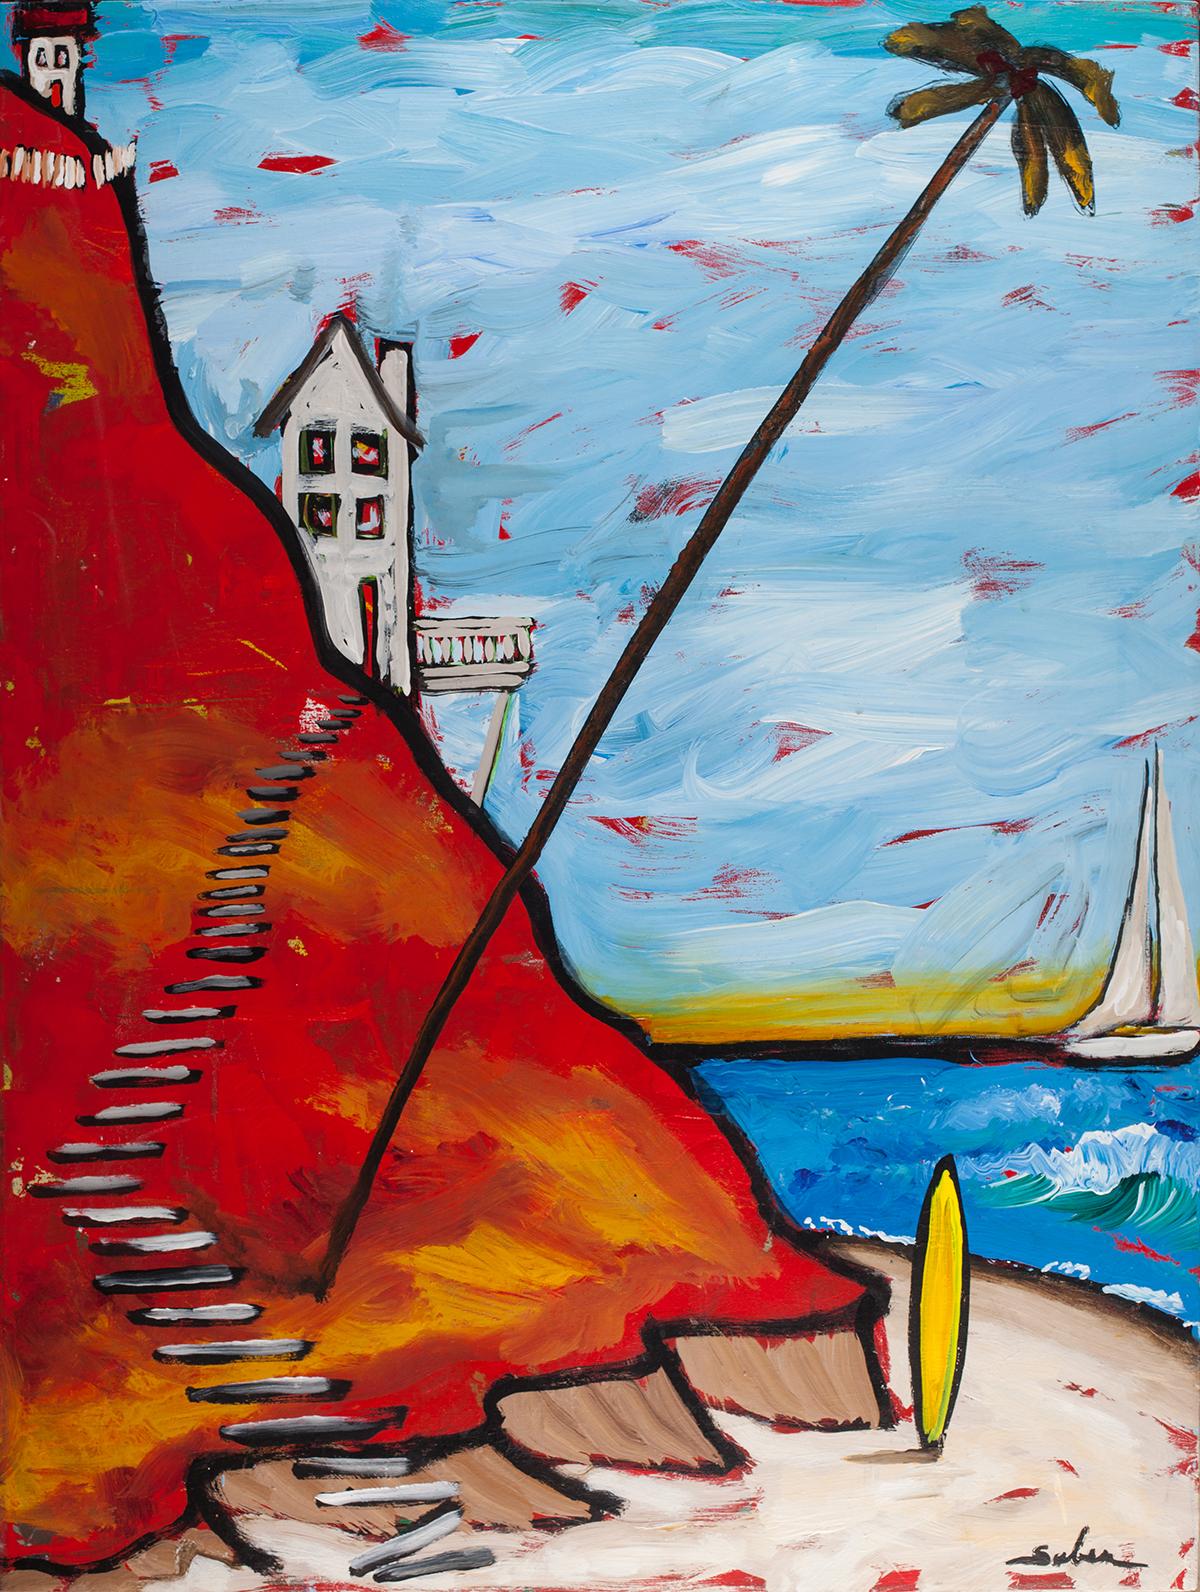 Seascape - Kirk Saber, San Diego Artist